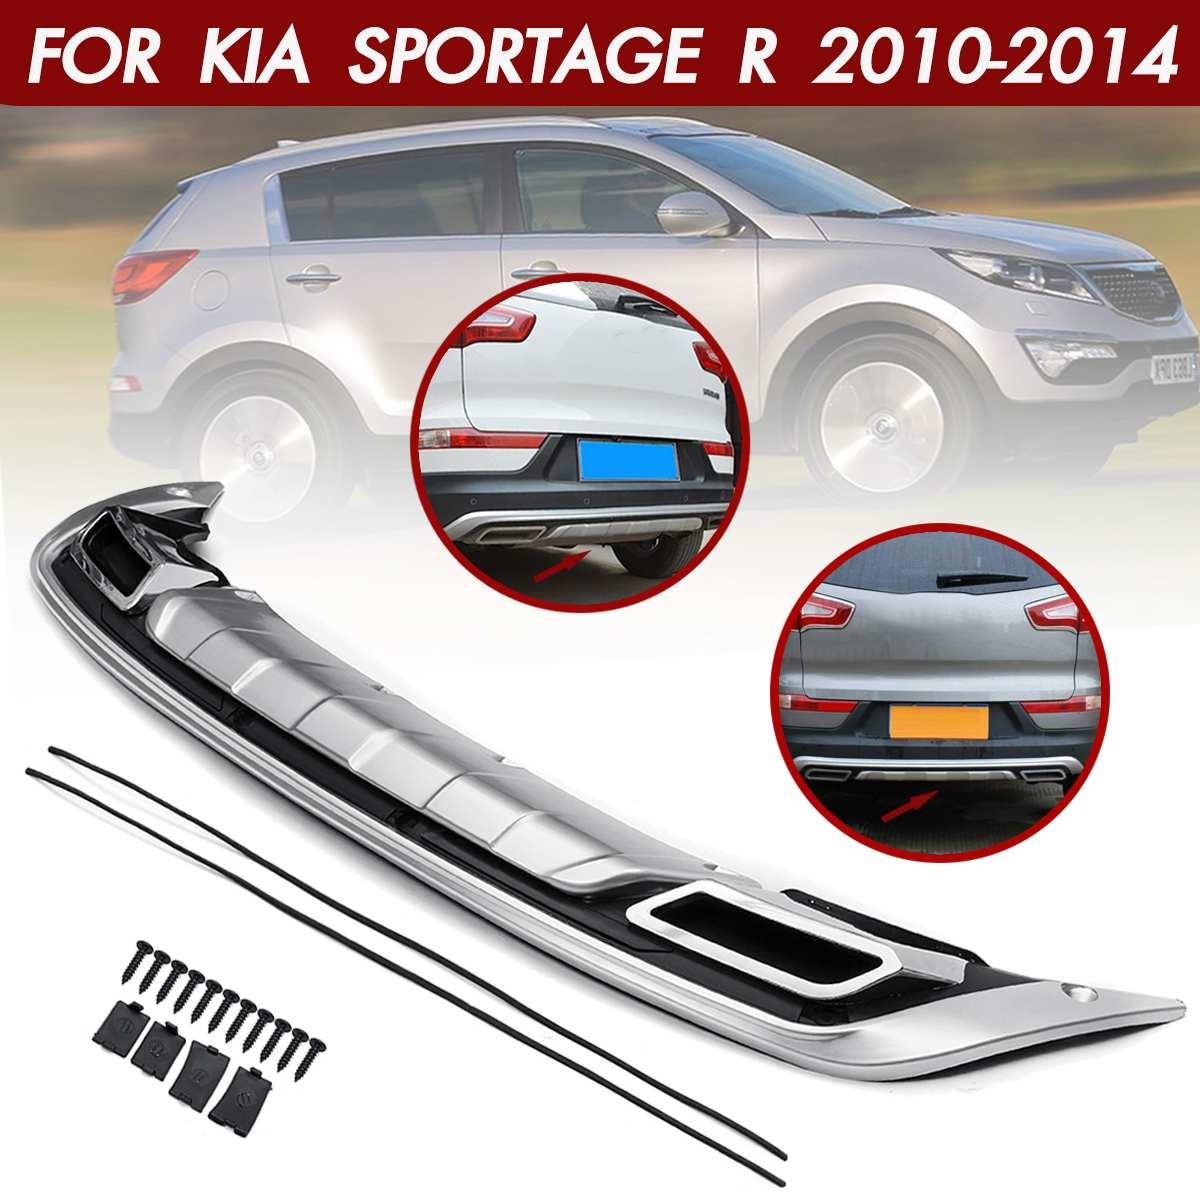 Car Rear Bumper Cover Trim Guard Protector Silver Bumpers Protection For Kia Sportage R 2010 2011 2012 2013 2014